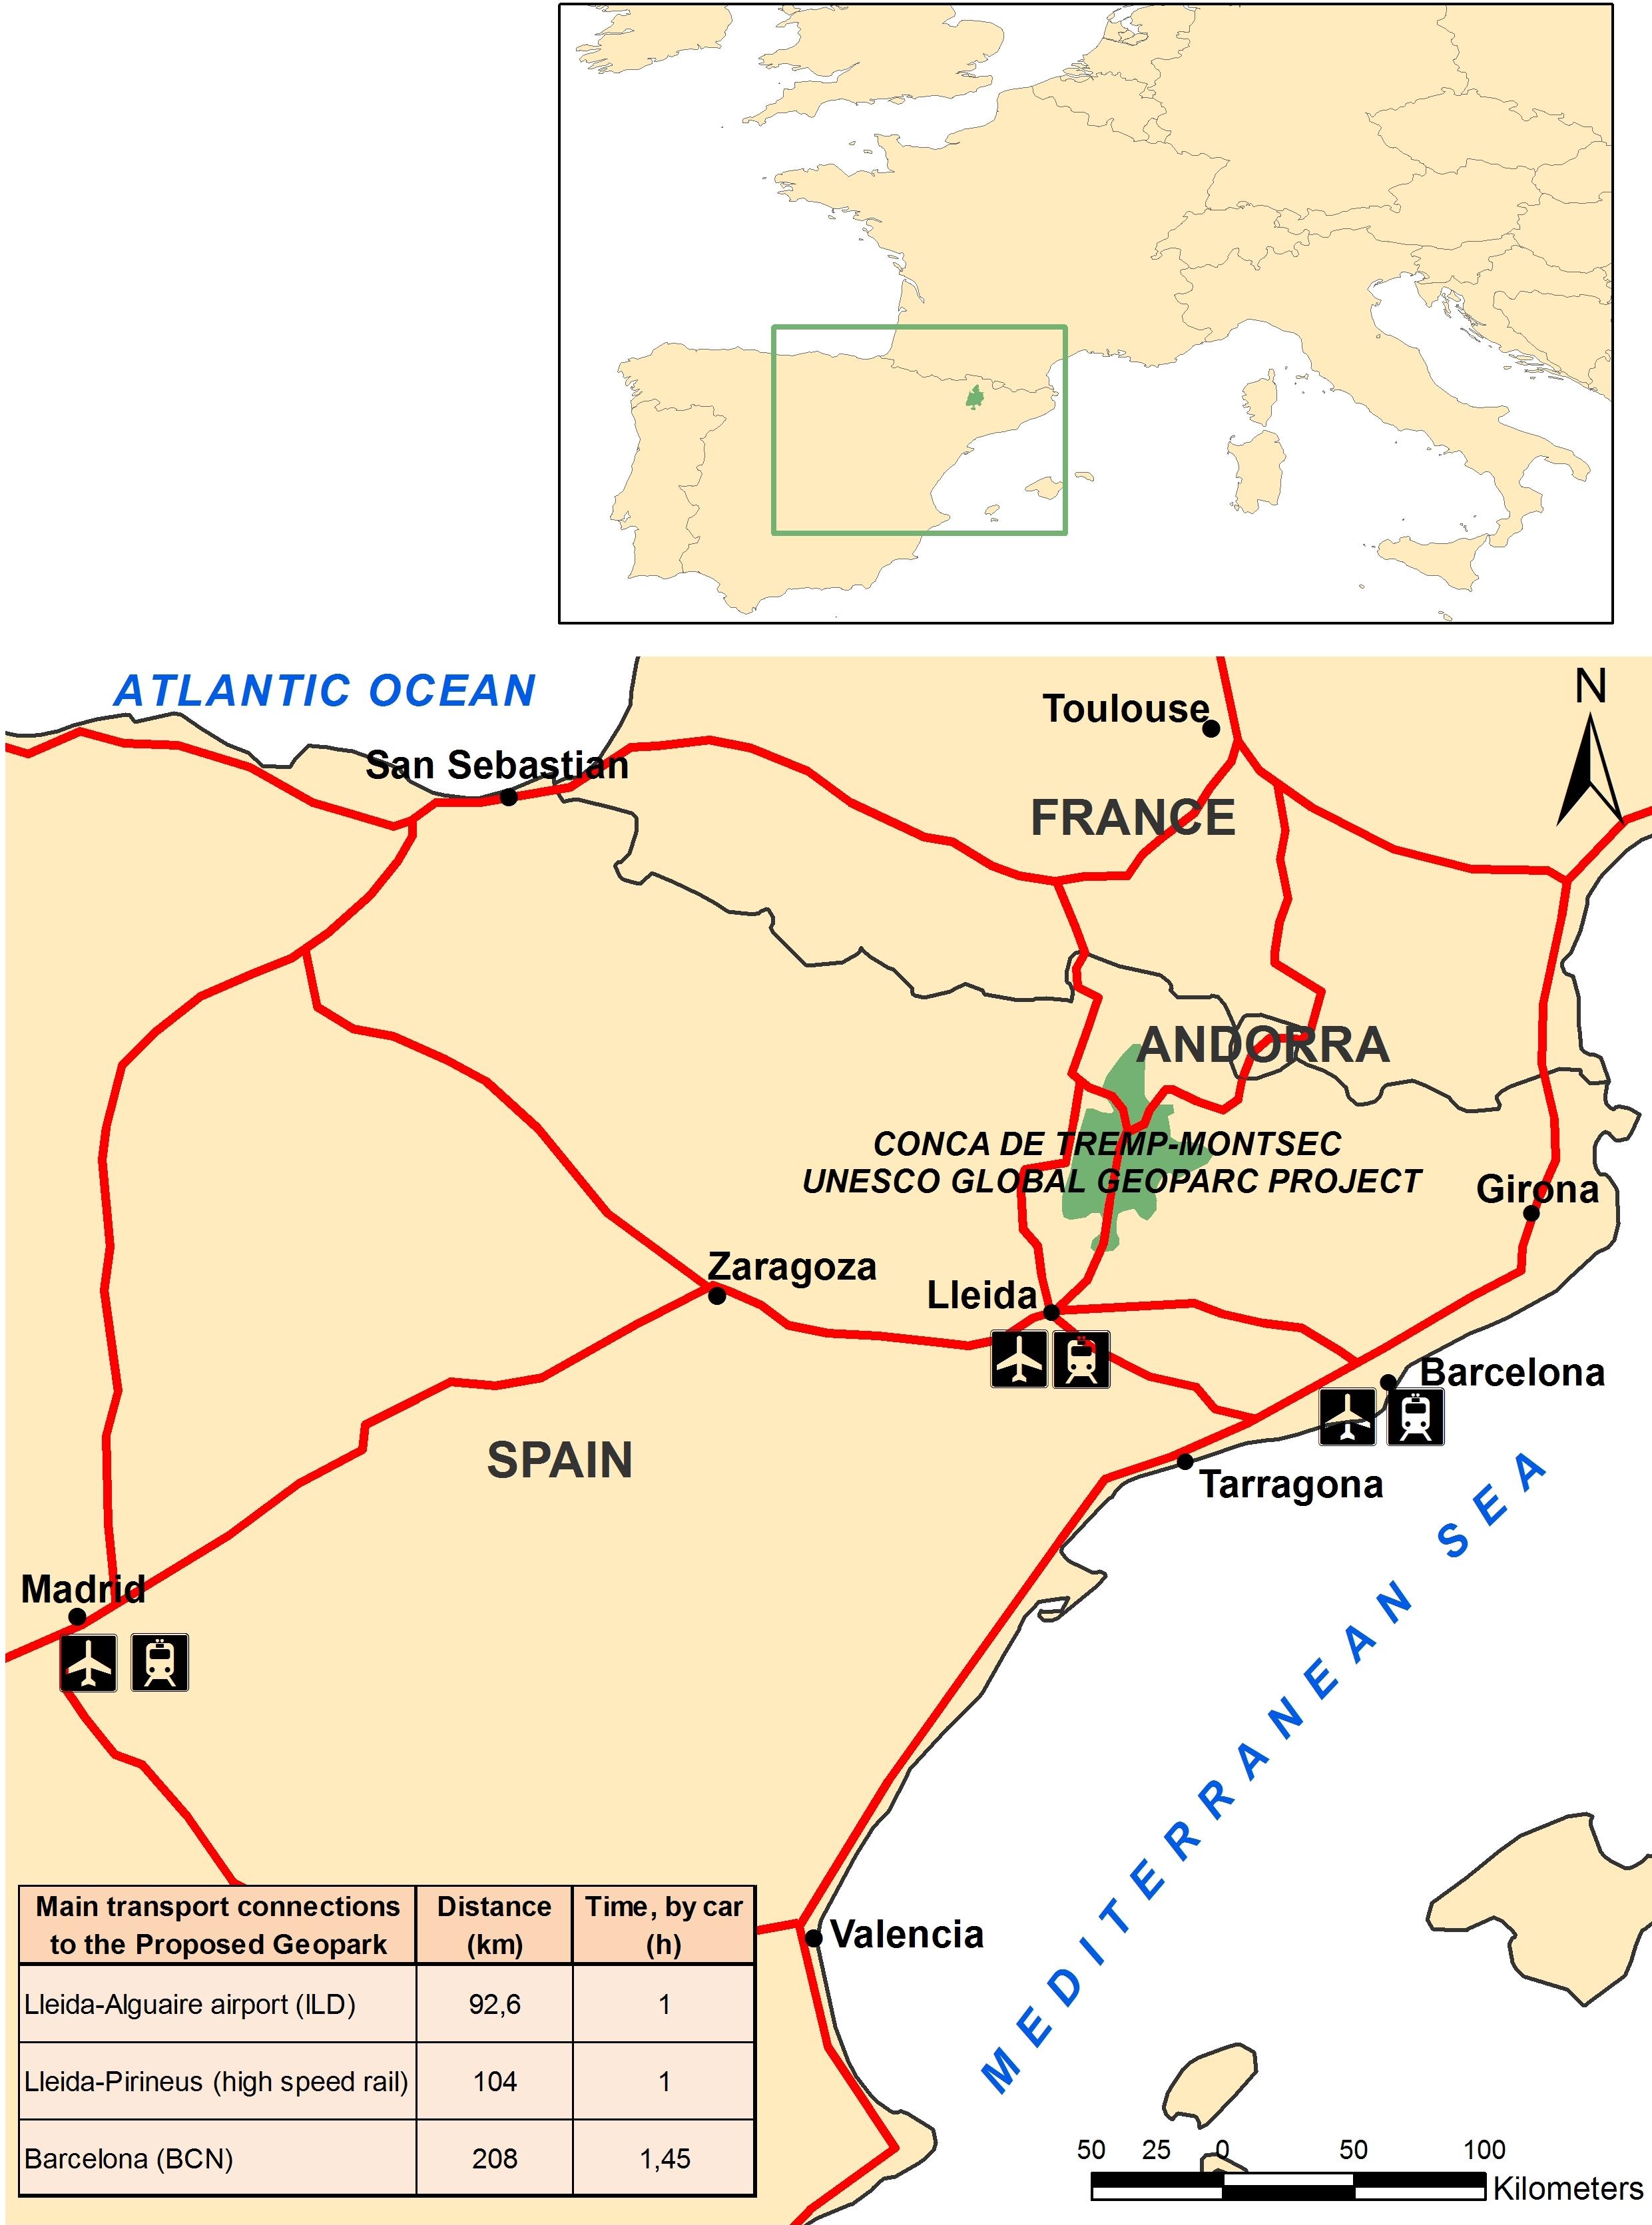 006_1st_map_Ambit_geoparc_Eur_Esp_v3